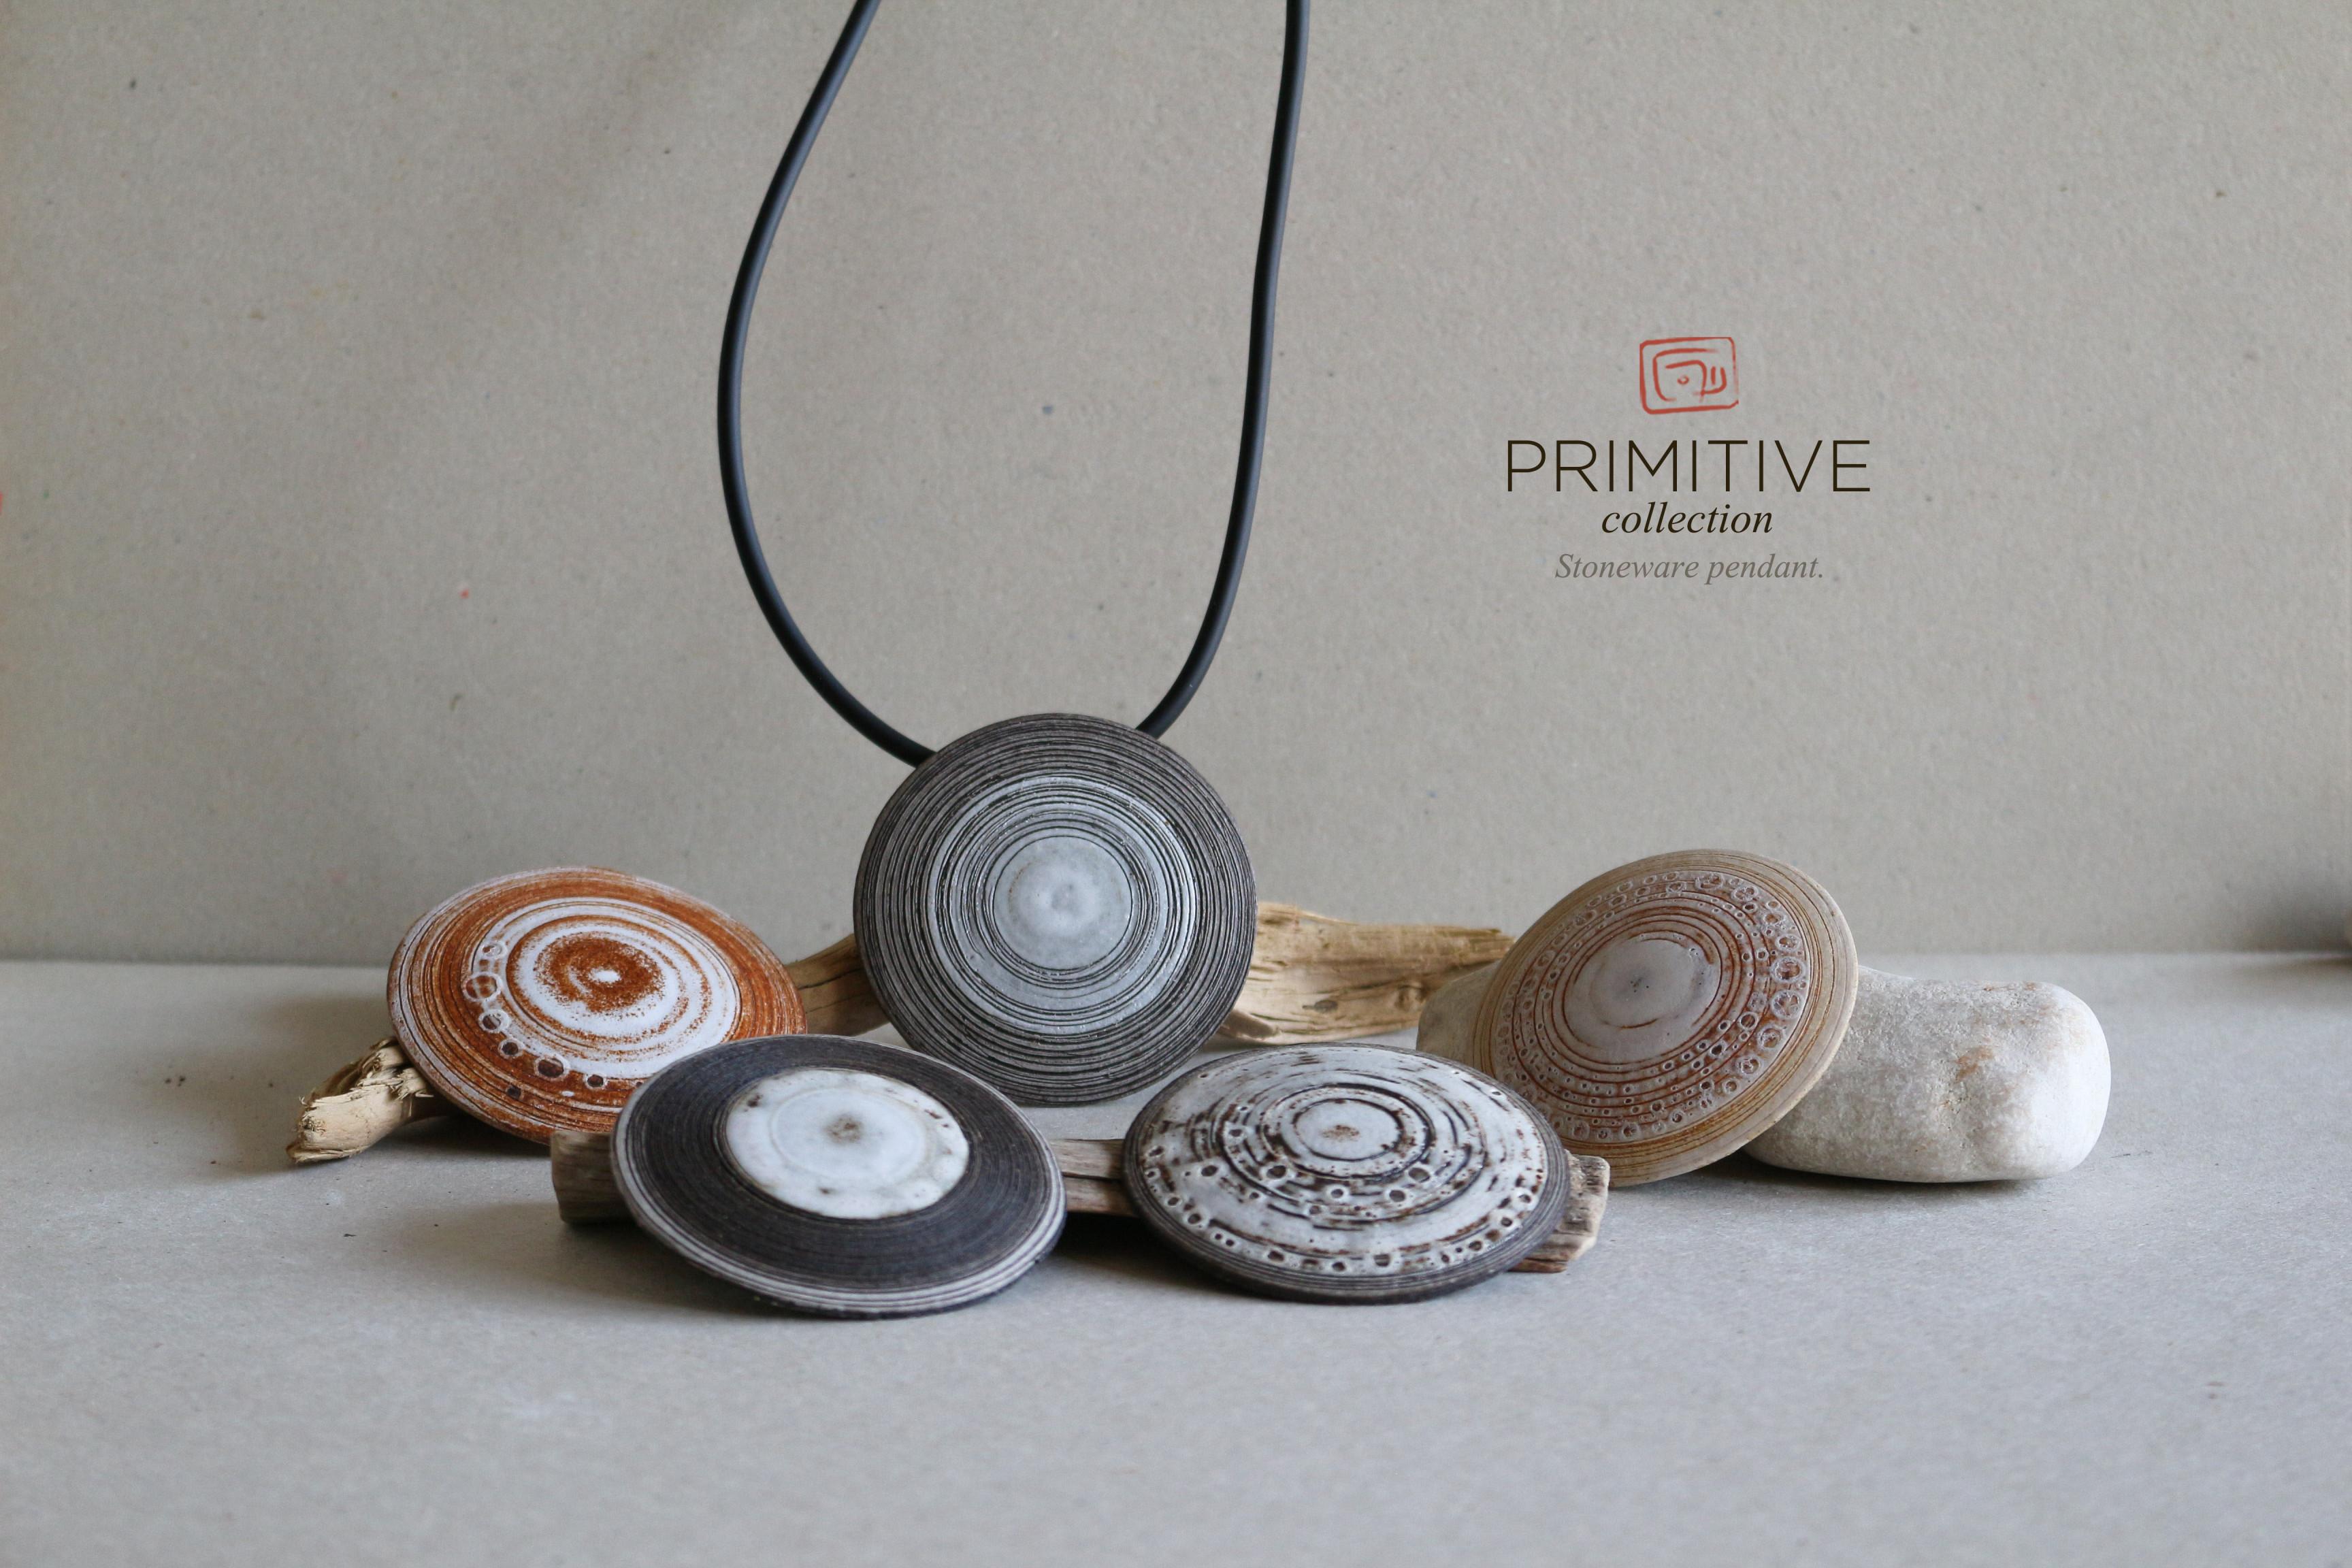 PRIMITIVE collection